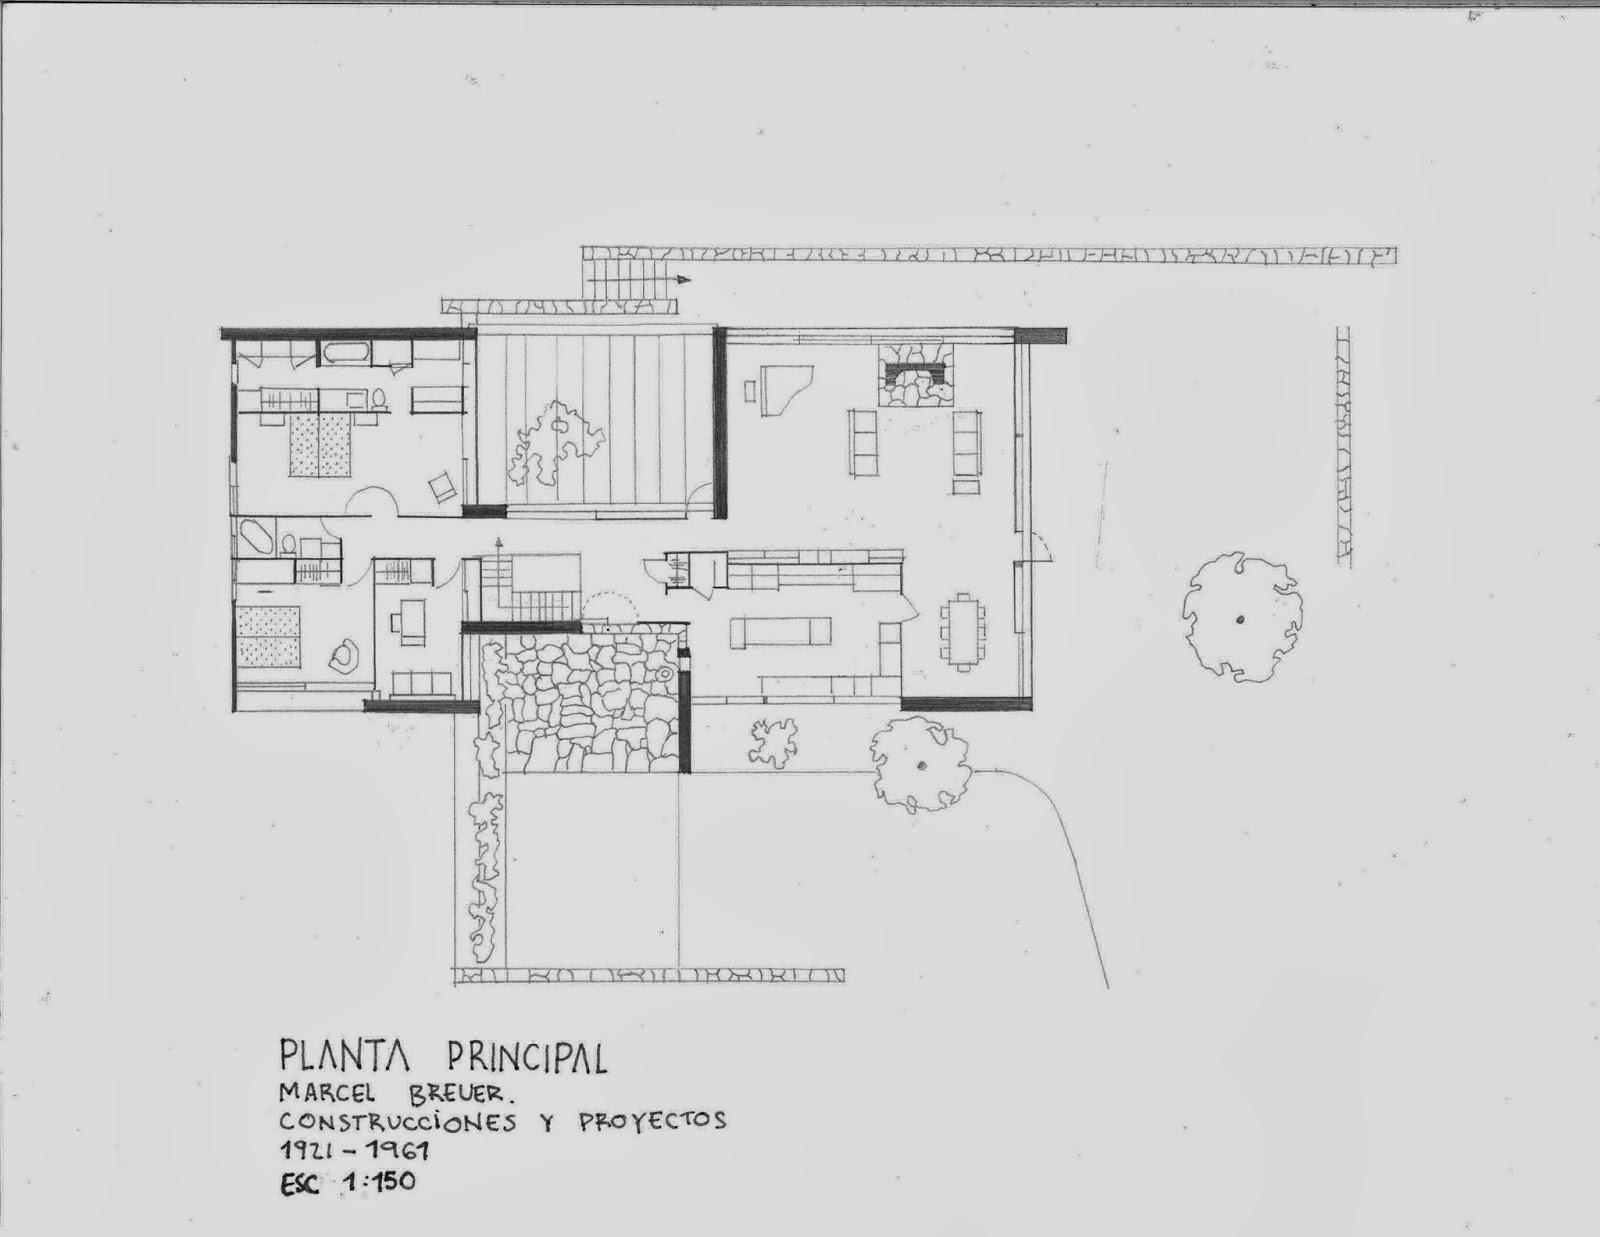 Historia de la arquitectura moderna casa clark marcel for Inicios de la arquitectura